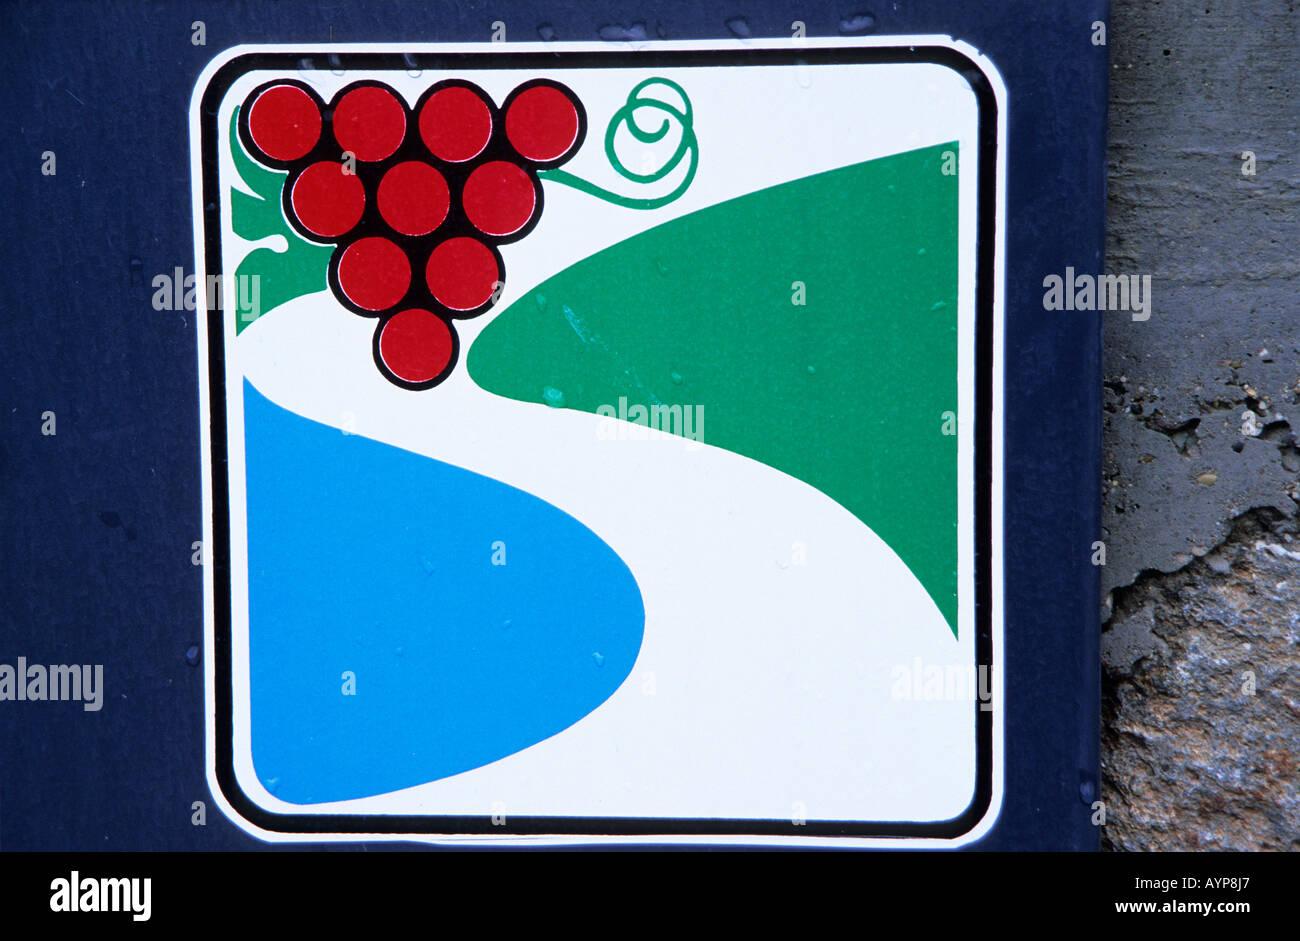 Wine Route sign Bardolino east side of Lago di Garda - Stock Image  sc 1 st  Alamy & Garda To Bardolino Route Stock Photos u0026 Garda To Bardolino Route ...